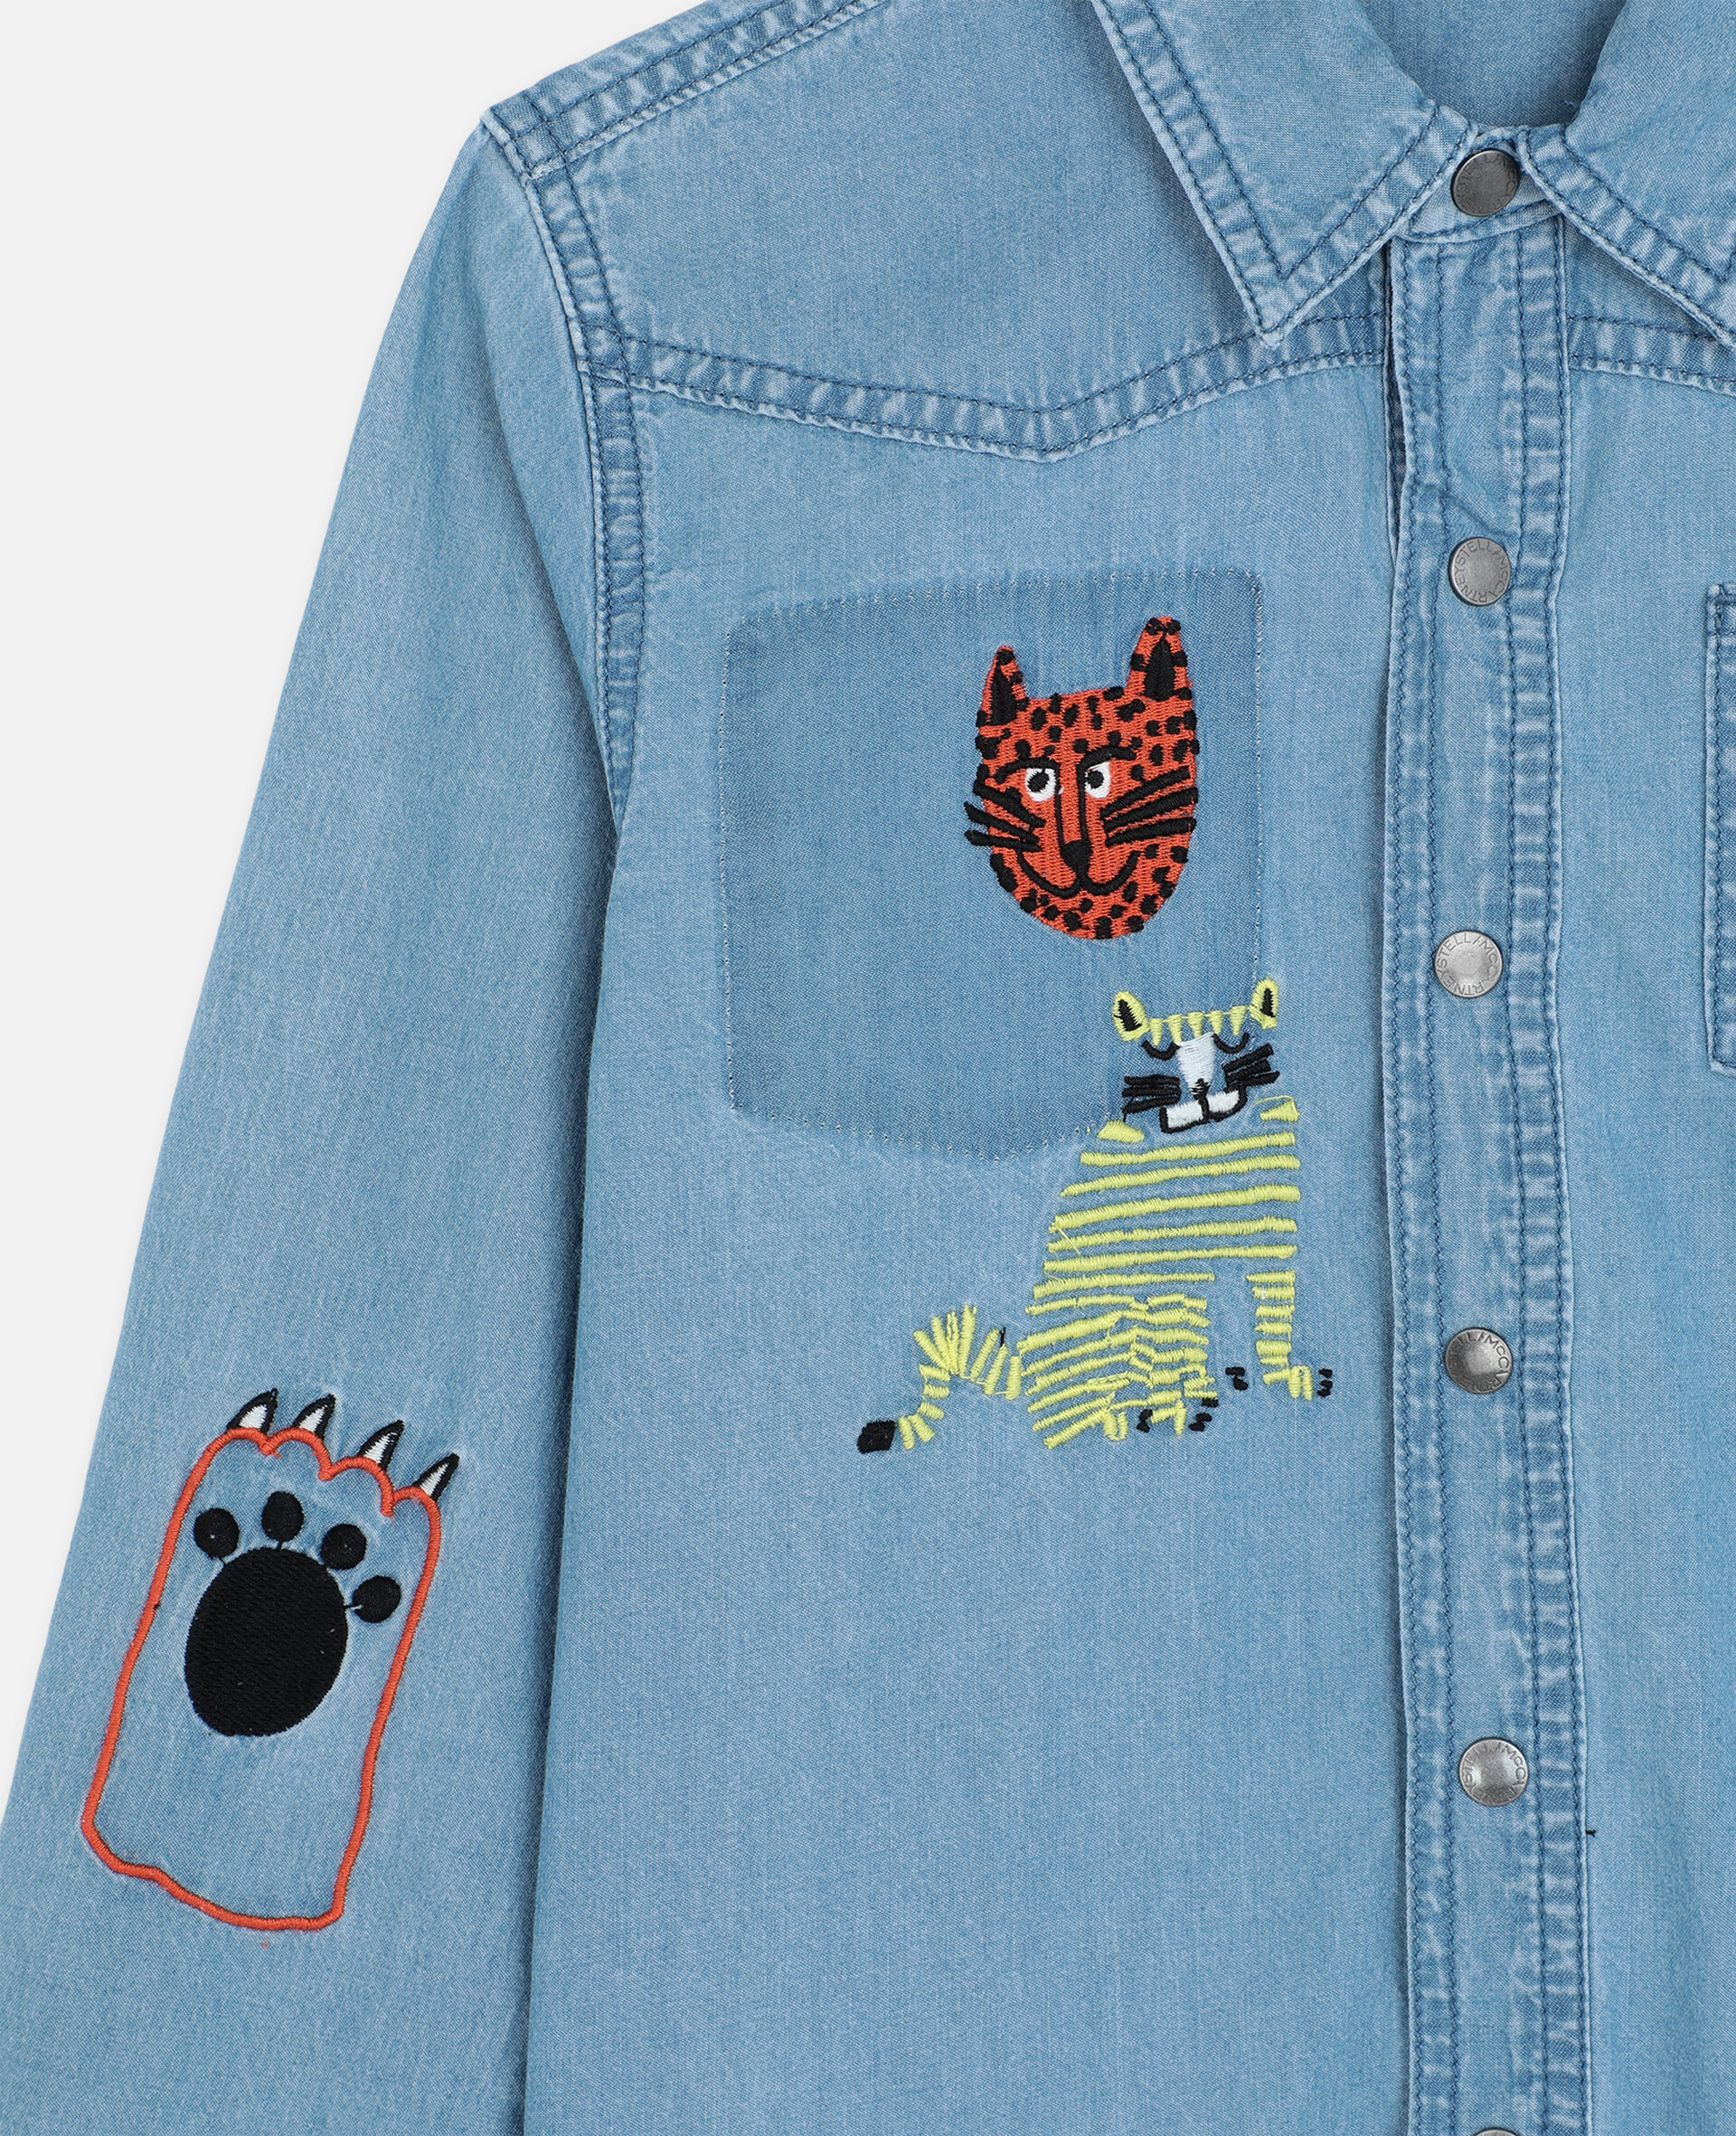 Embroidered Cats 棉质钱布雷布衬衫 -蓝色-large image number 1